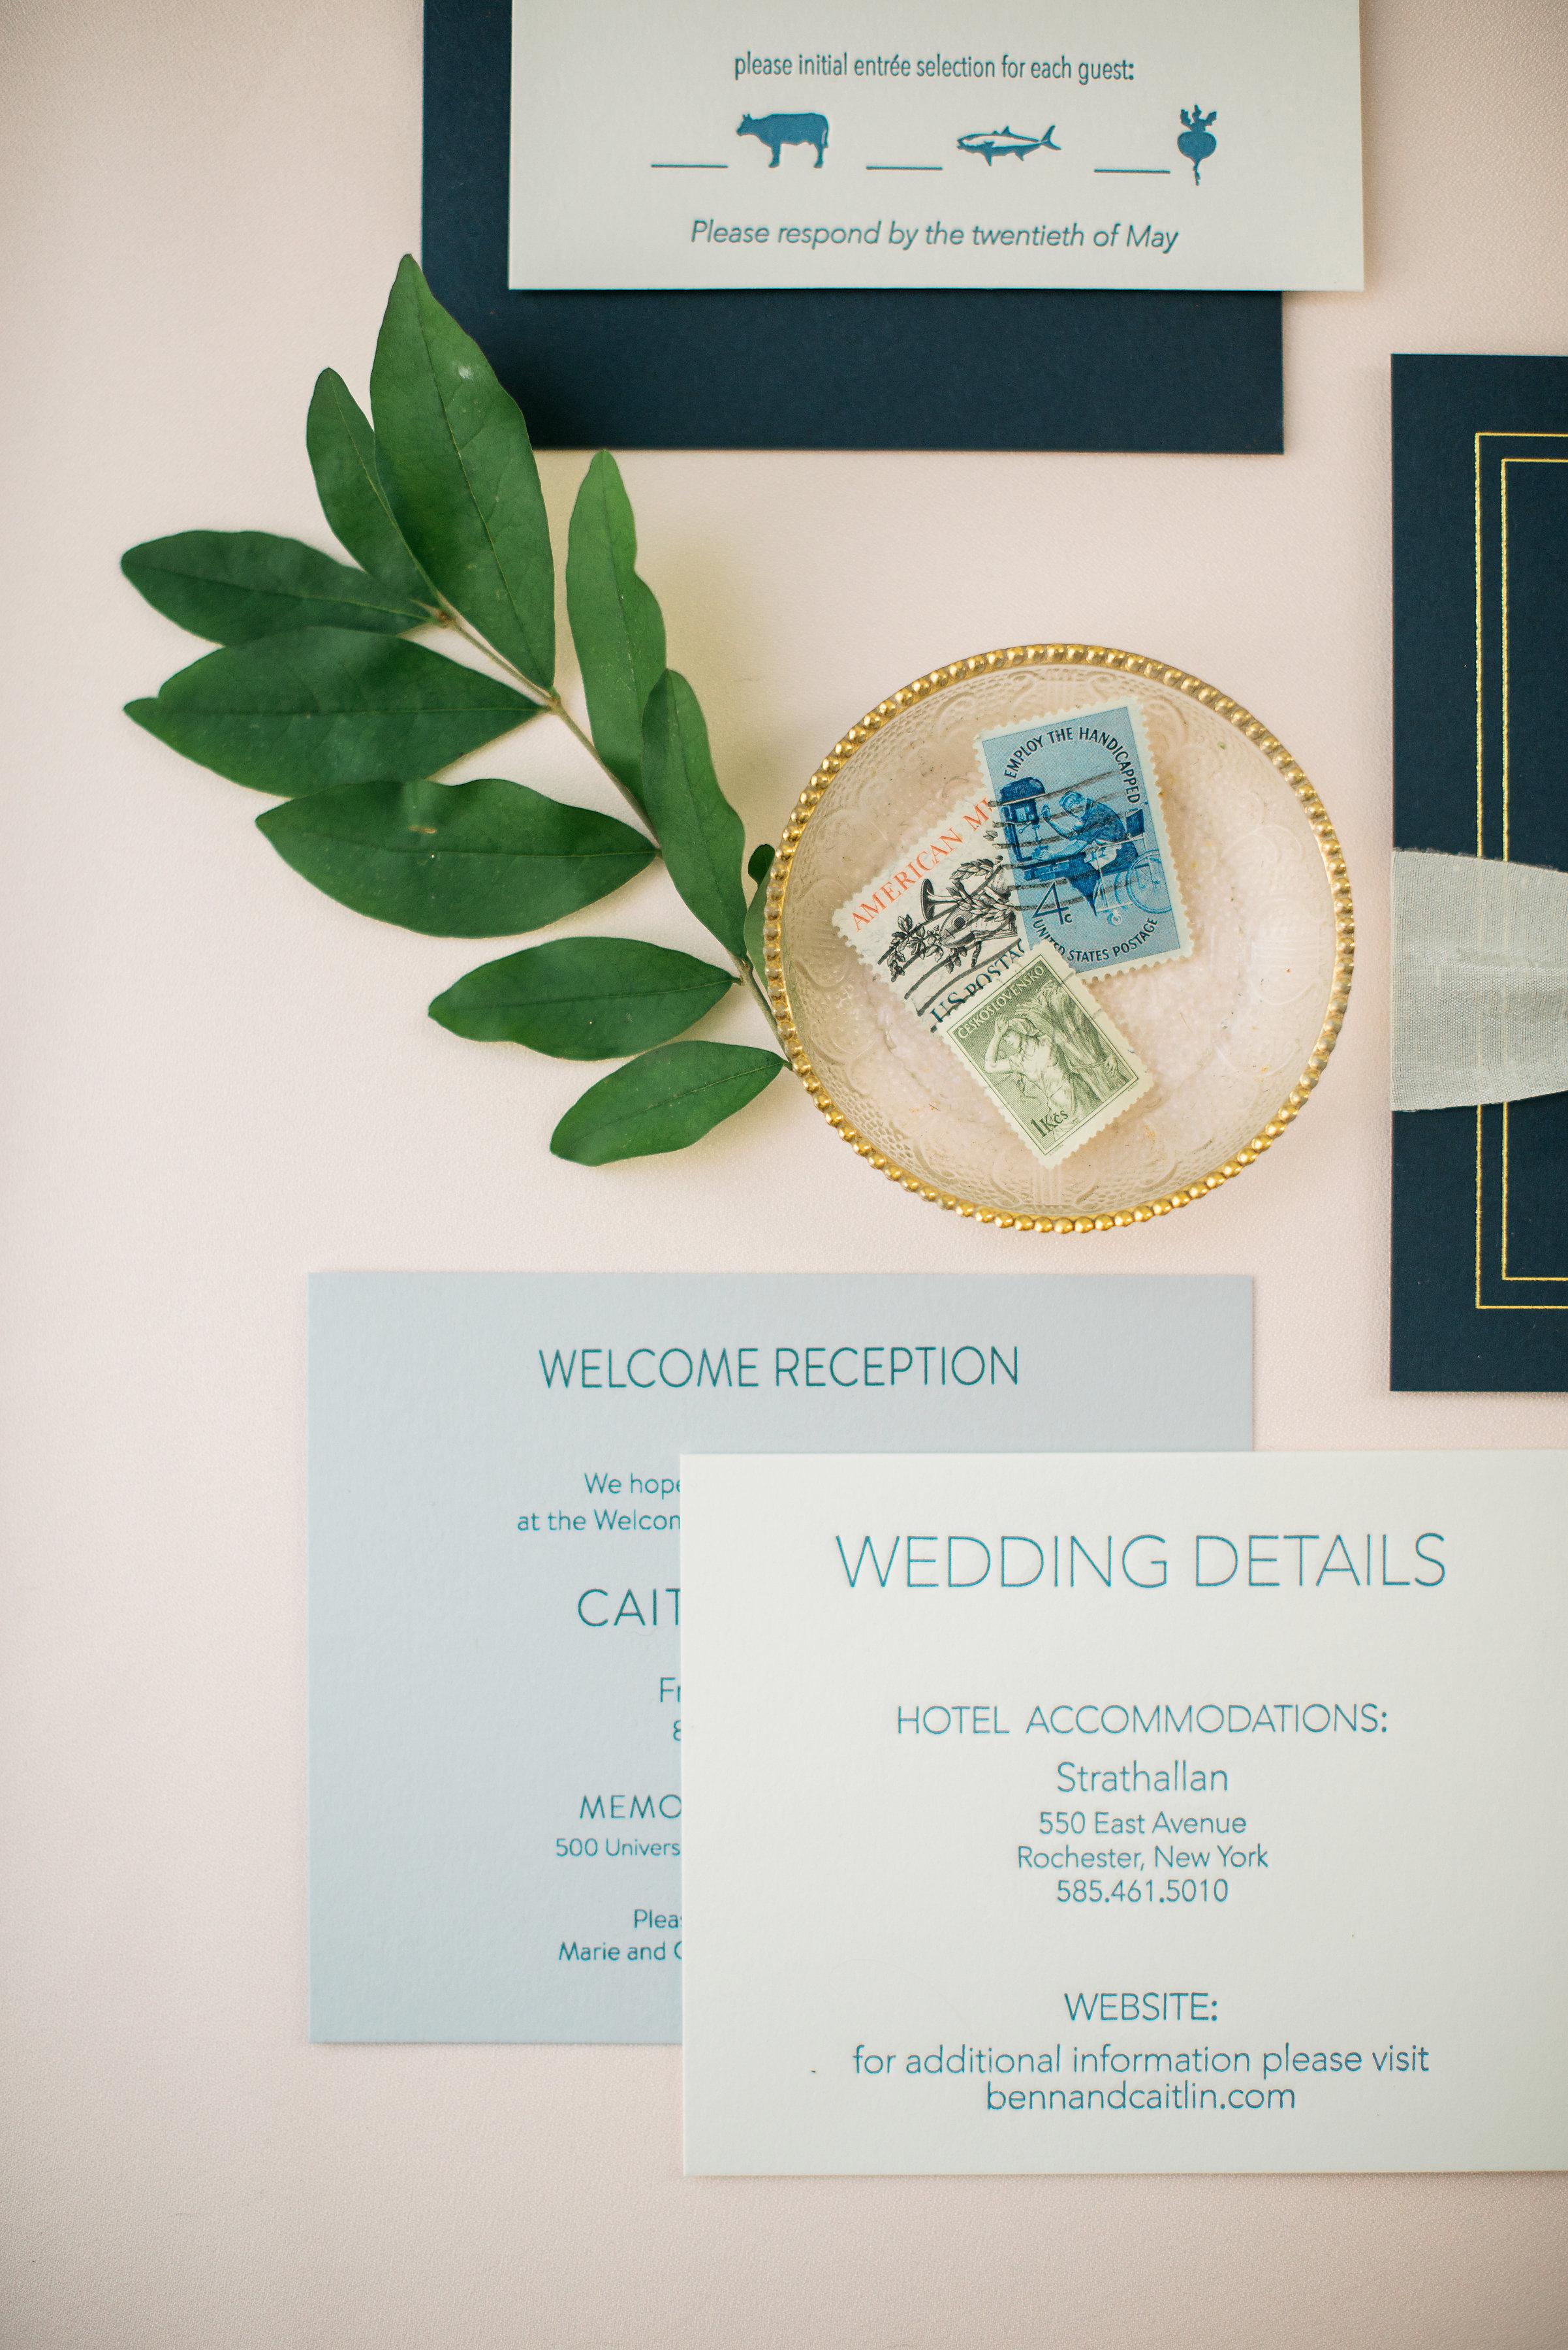 Alexandra-Elise-Photography-Ali-Reed-Caitlin-Benn-Film-Oak-Hill-Wedding-Reception-003.jpg